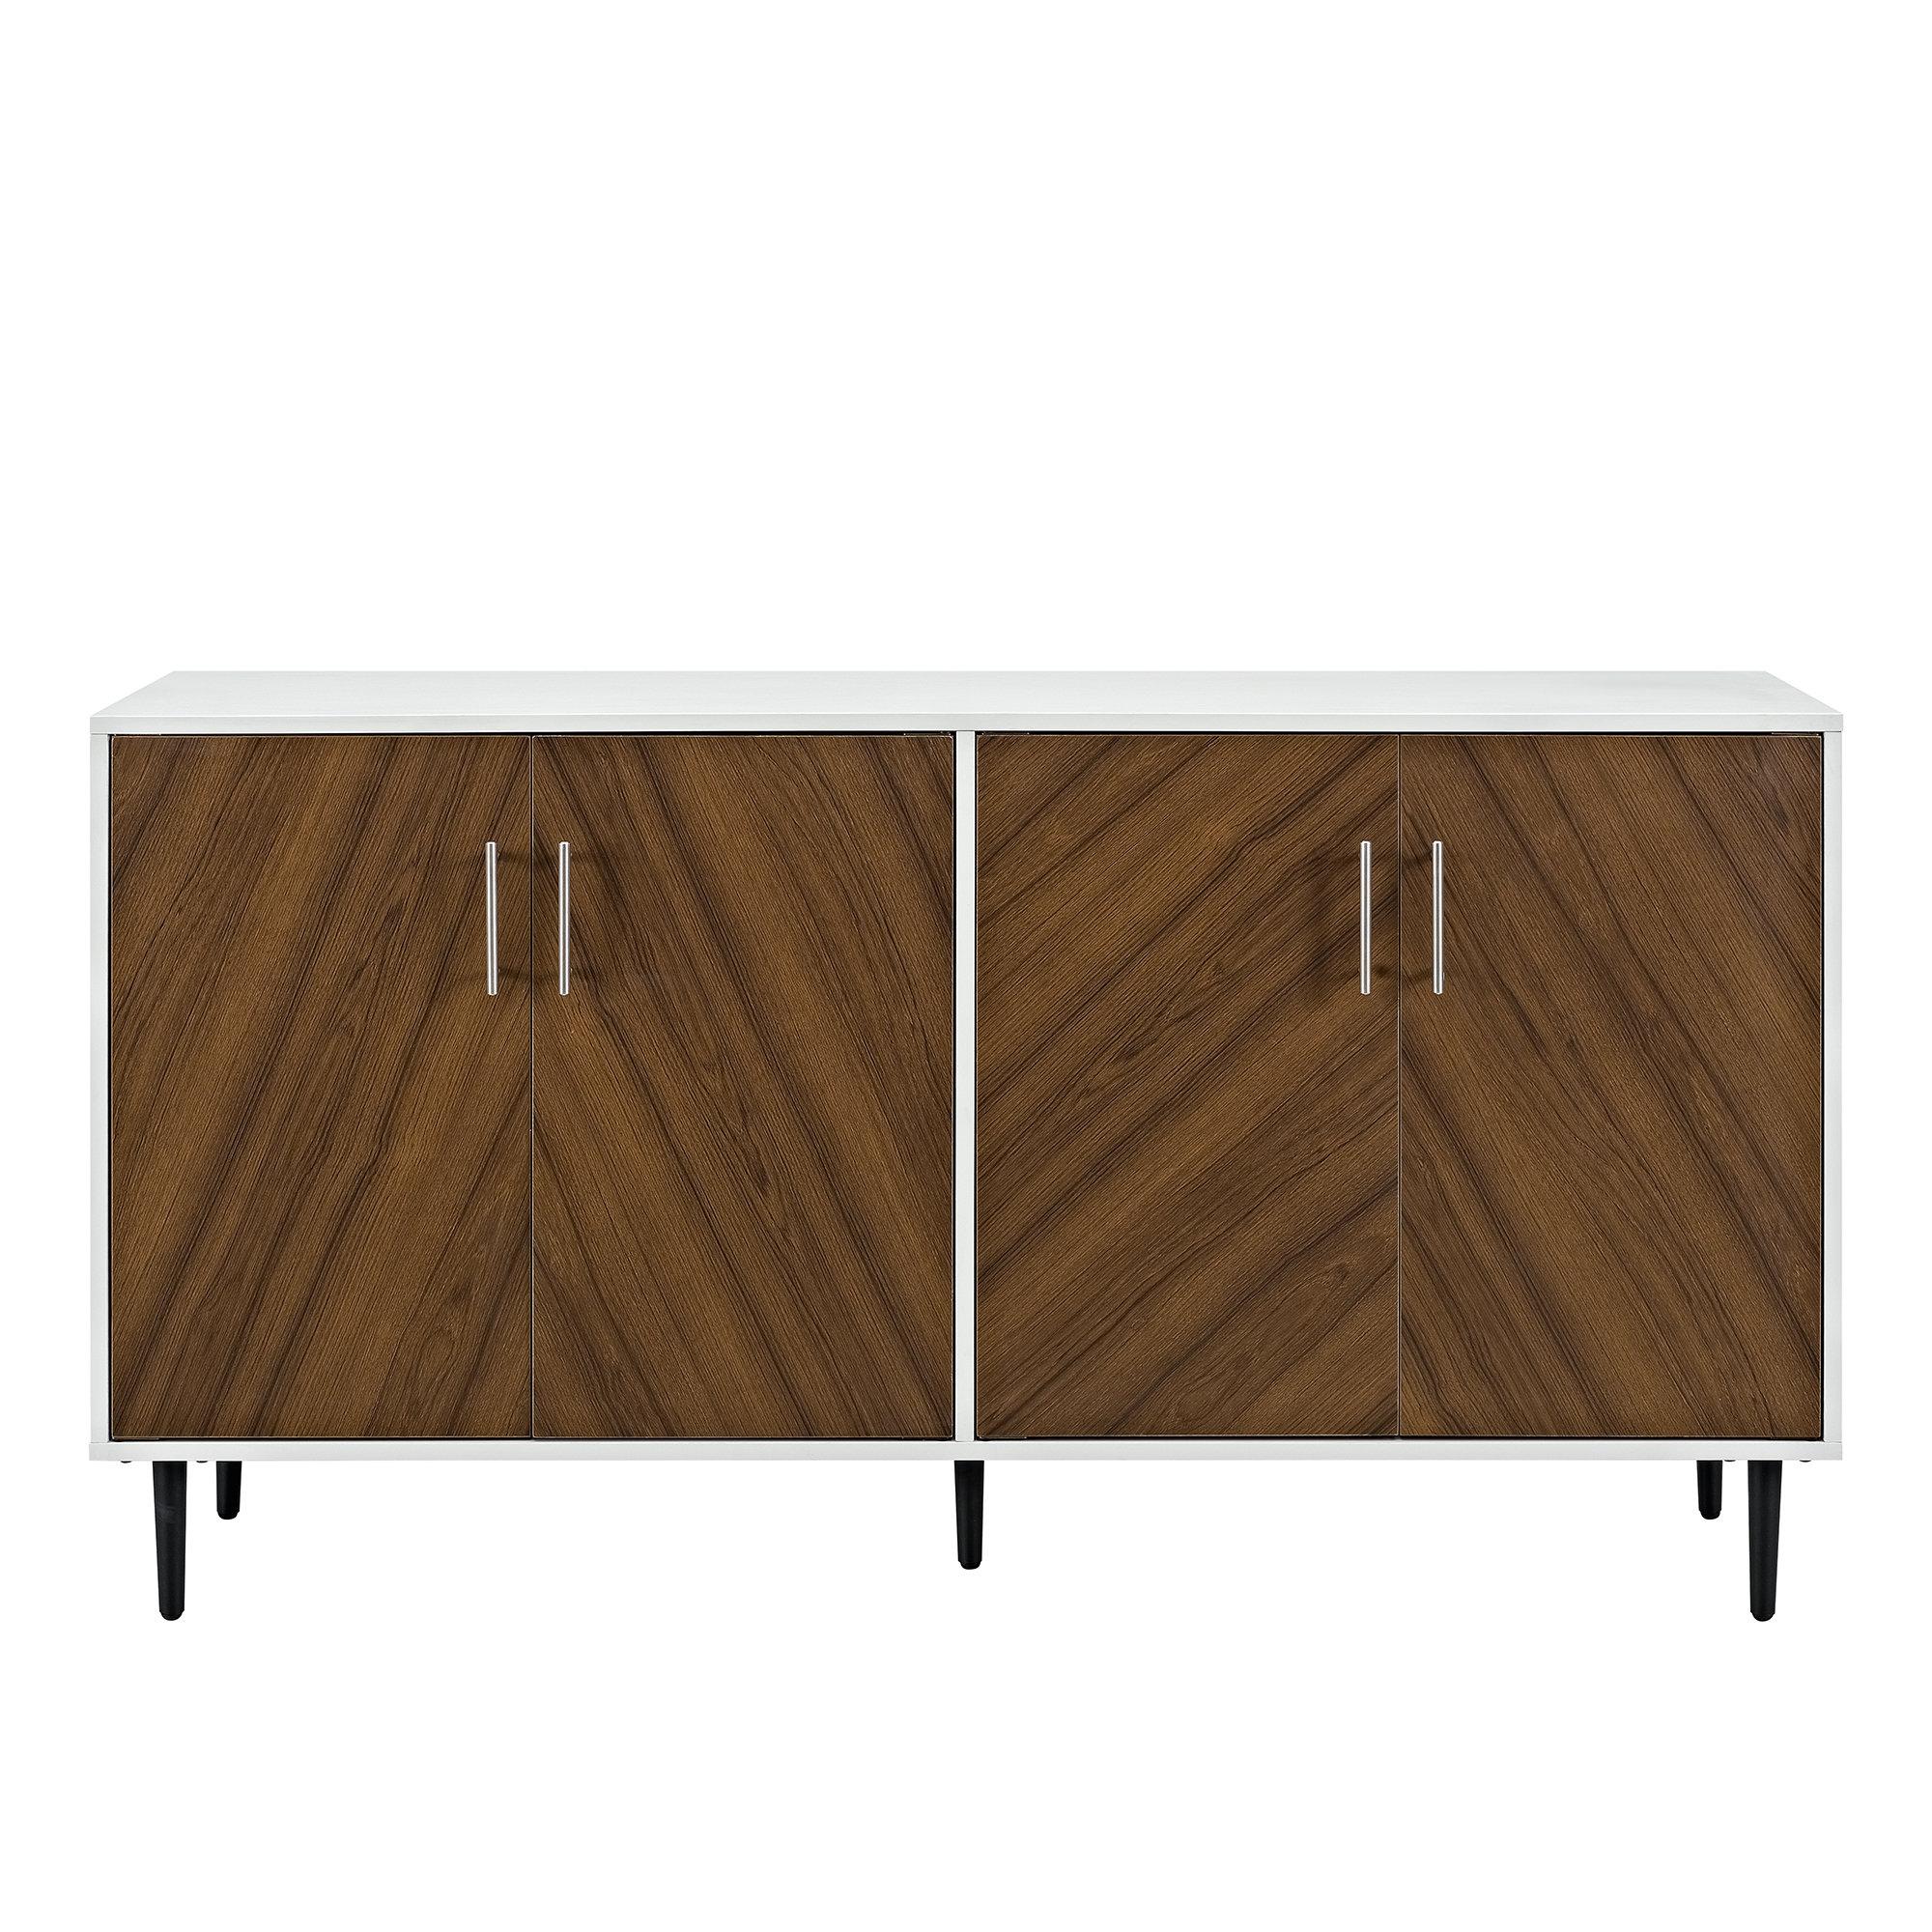 Modern Brown Sideboards + Buffets | Allmodern for Stennis Sideboards (Image 13 of 30)